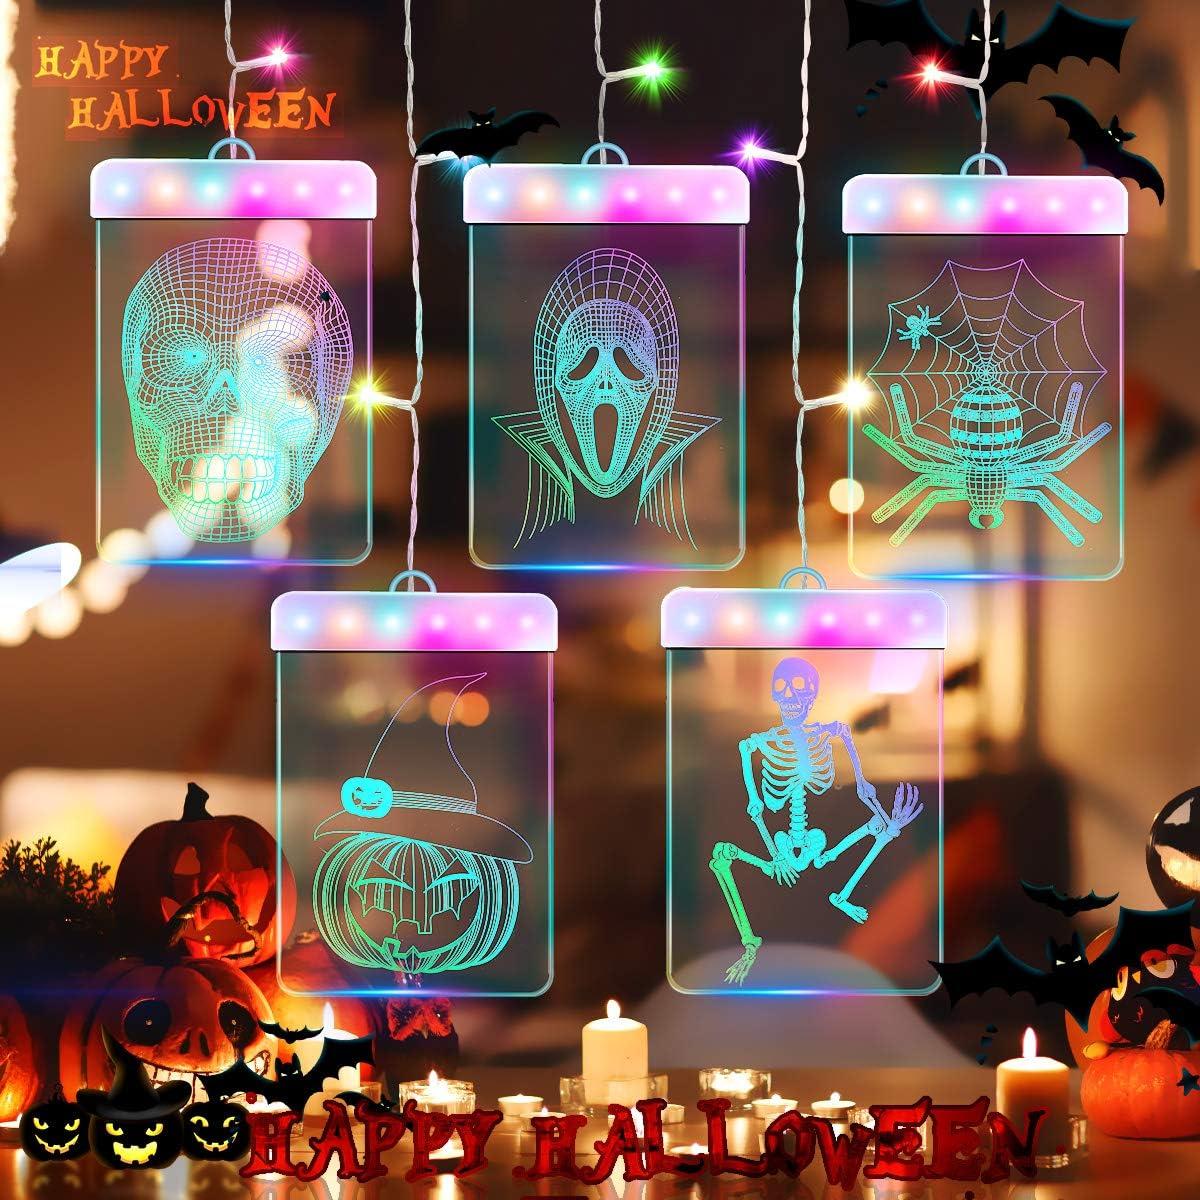 3D LED Halloween Lights Outdoor Indoor, Jhua Halloween Fairy Hanging Lights Outdoor String Lights USB Window Curtain Lights Waterproof Halloween Decor Light for Home Bedroom Window Wall, Multicolor